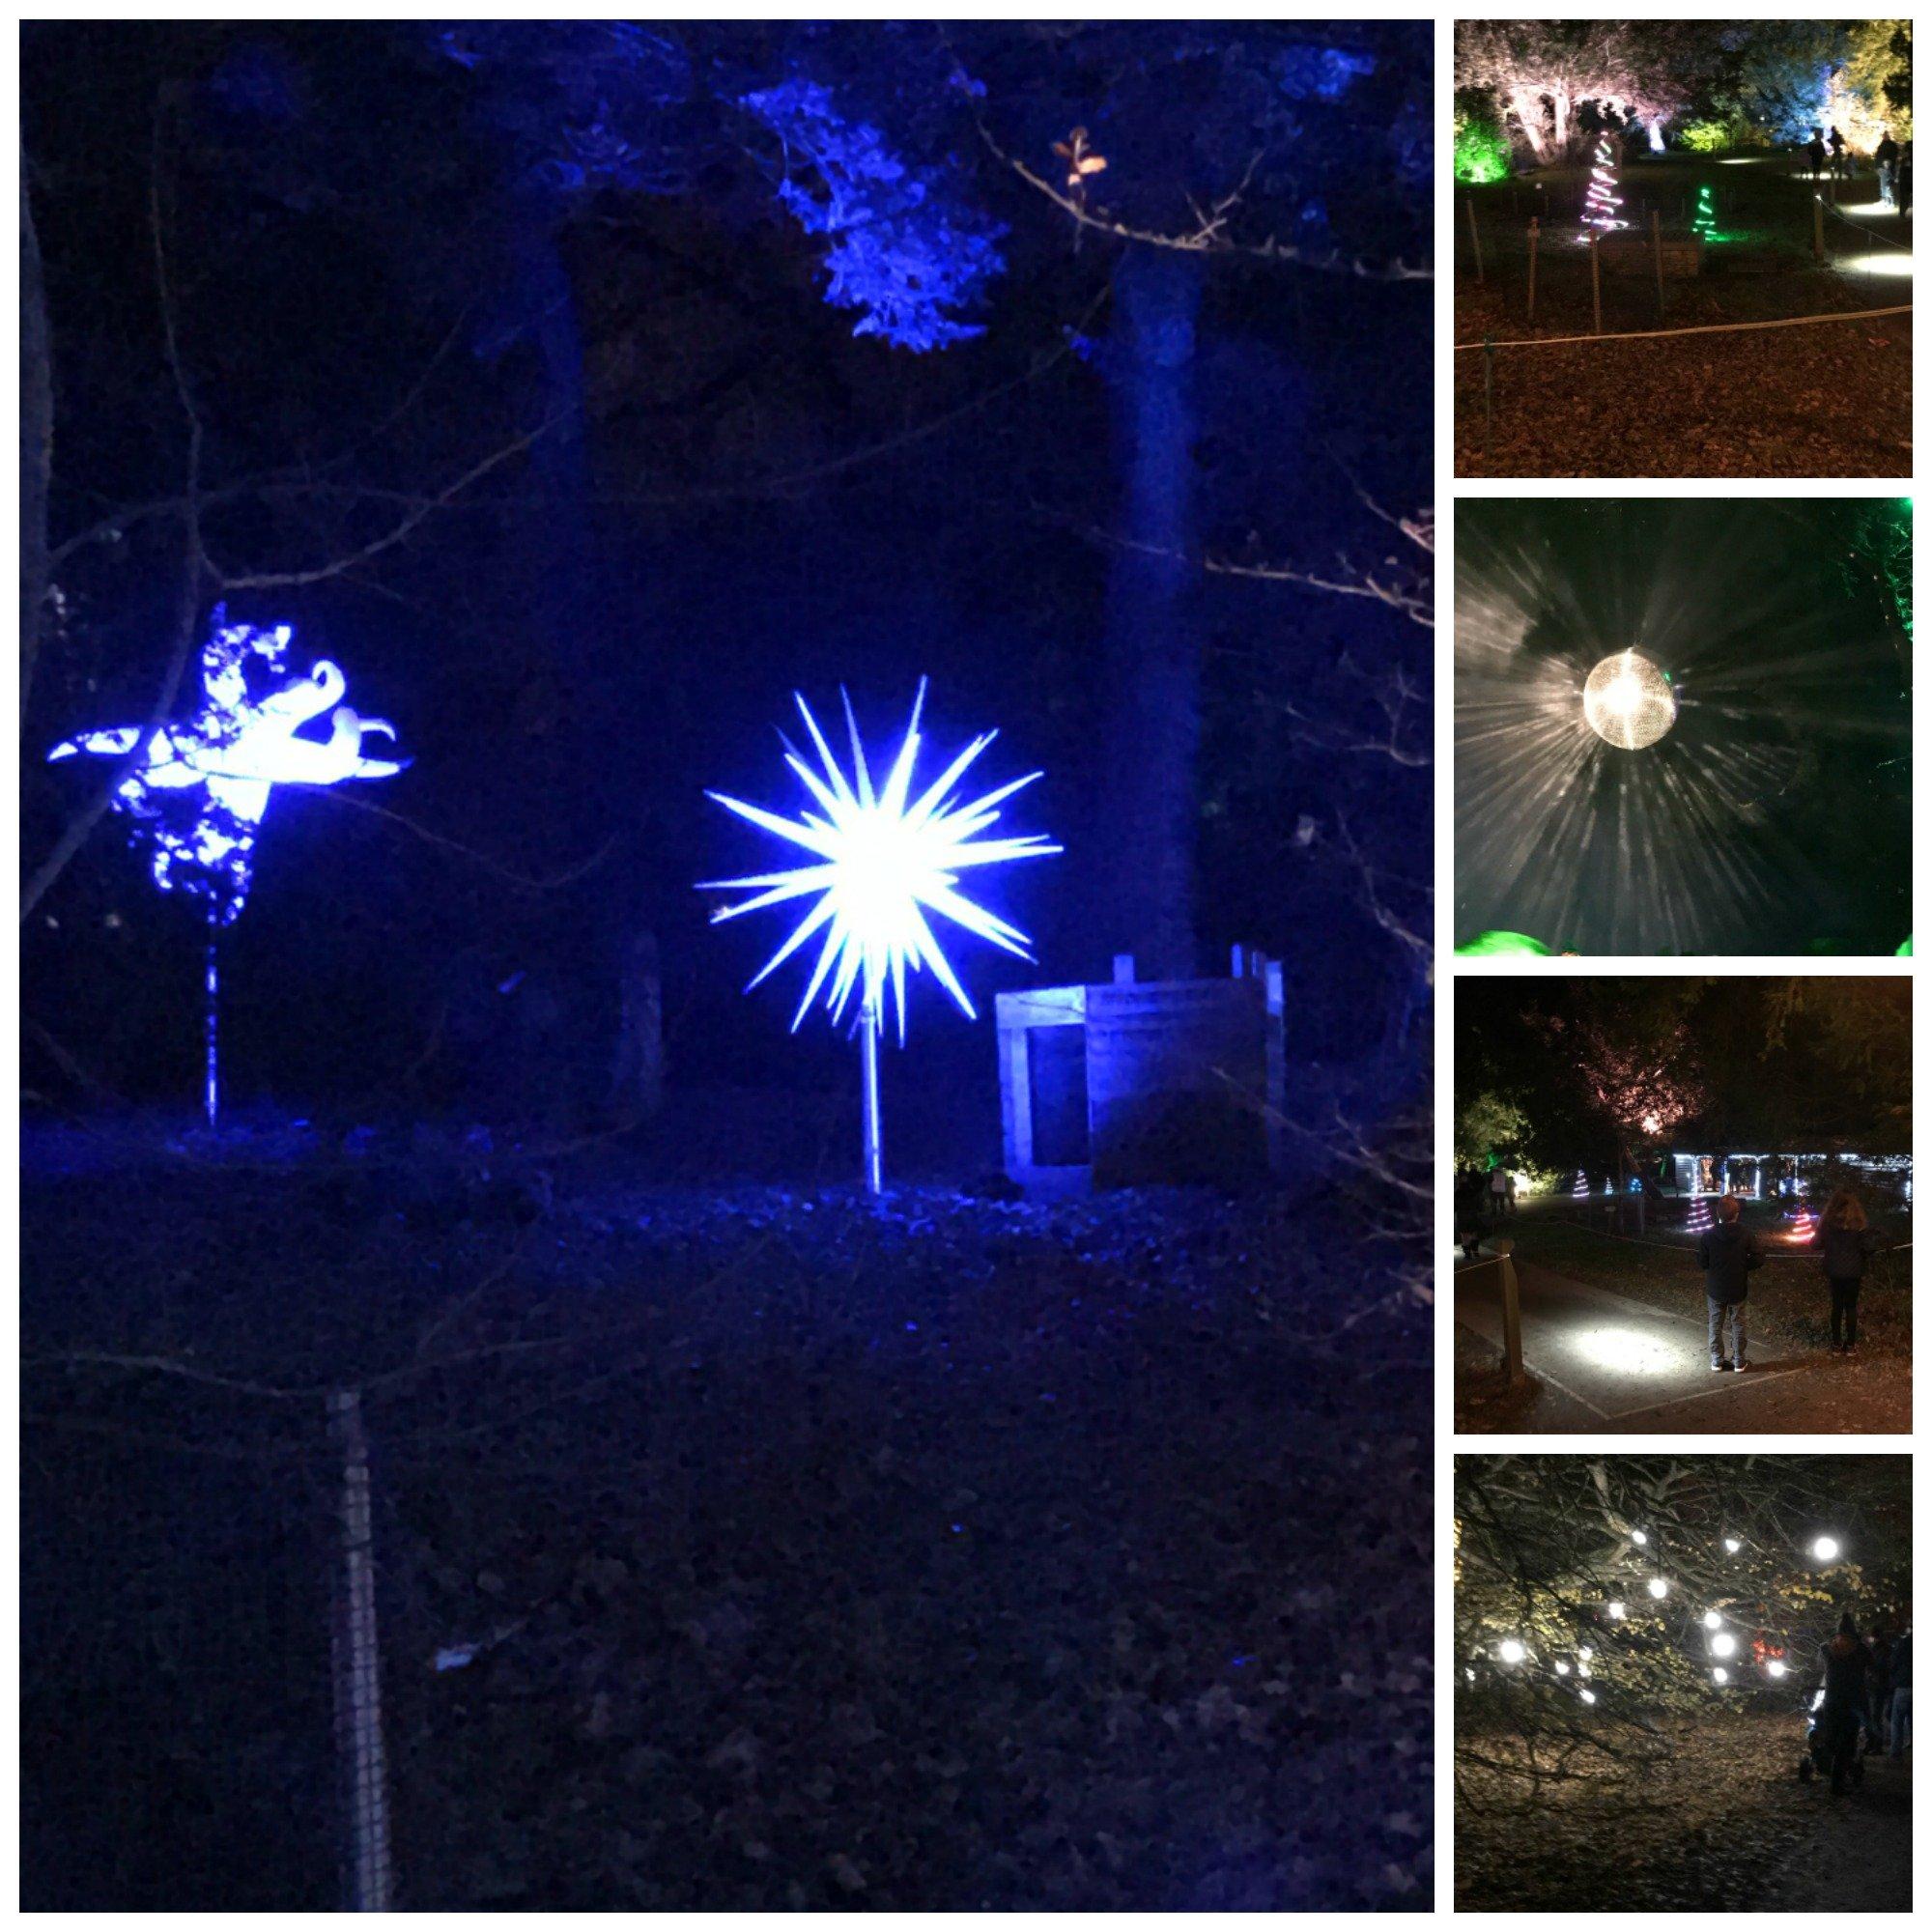 Impressive light displays at Westonbirt Arboretum Enchanted Christmas Trail 2017